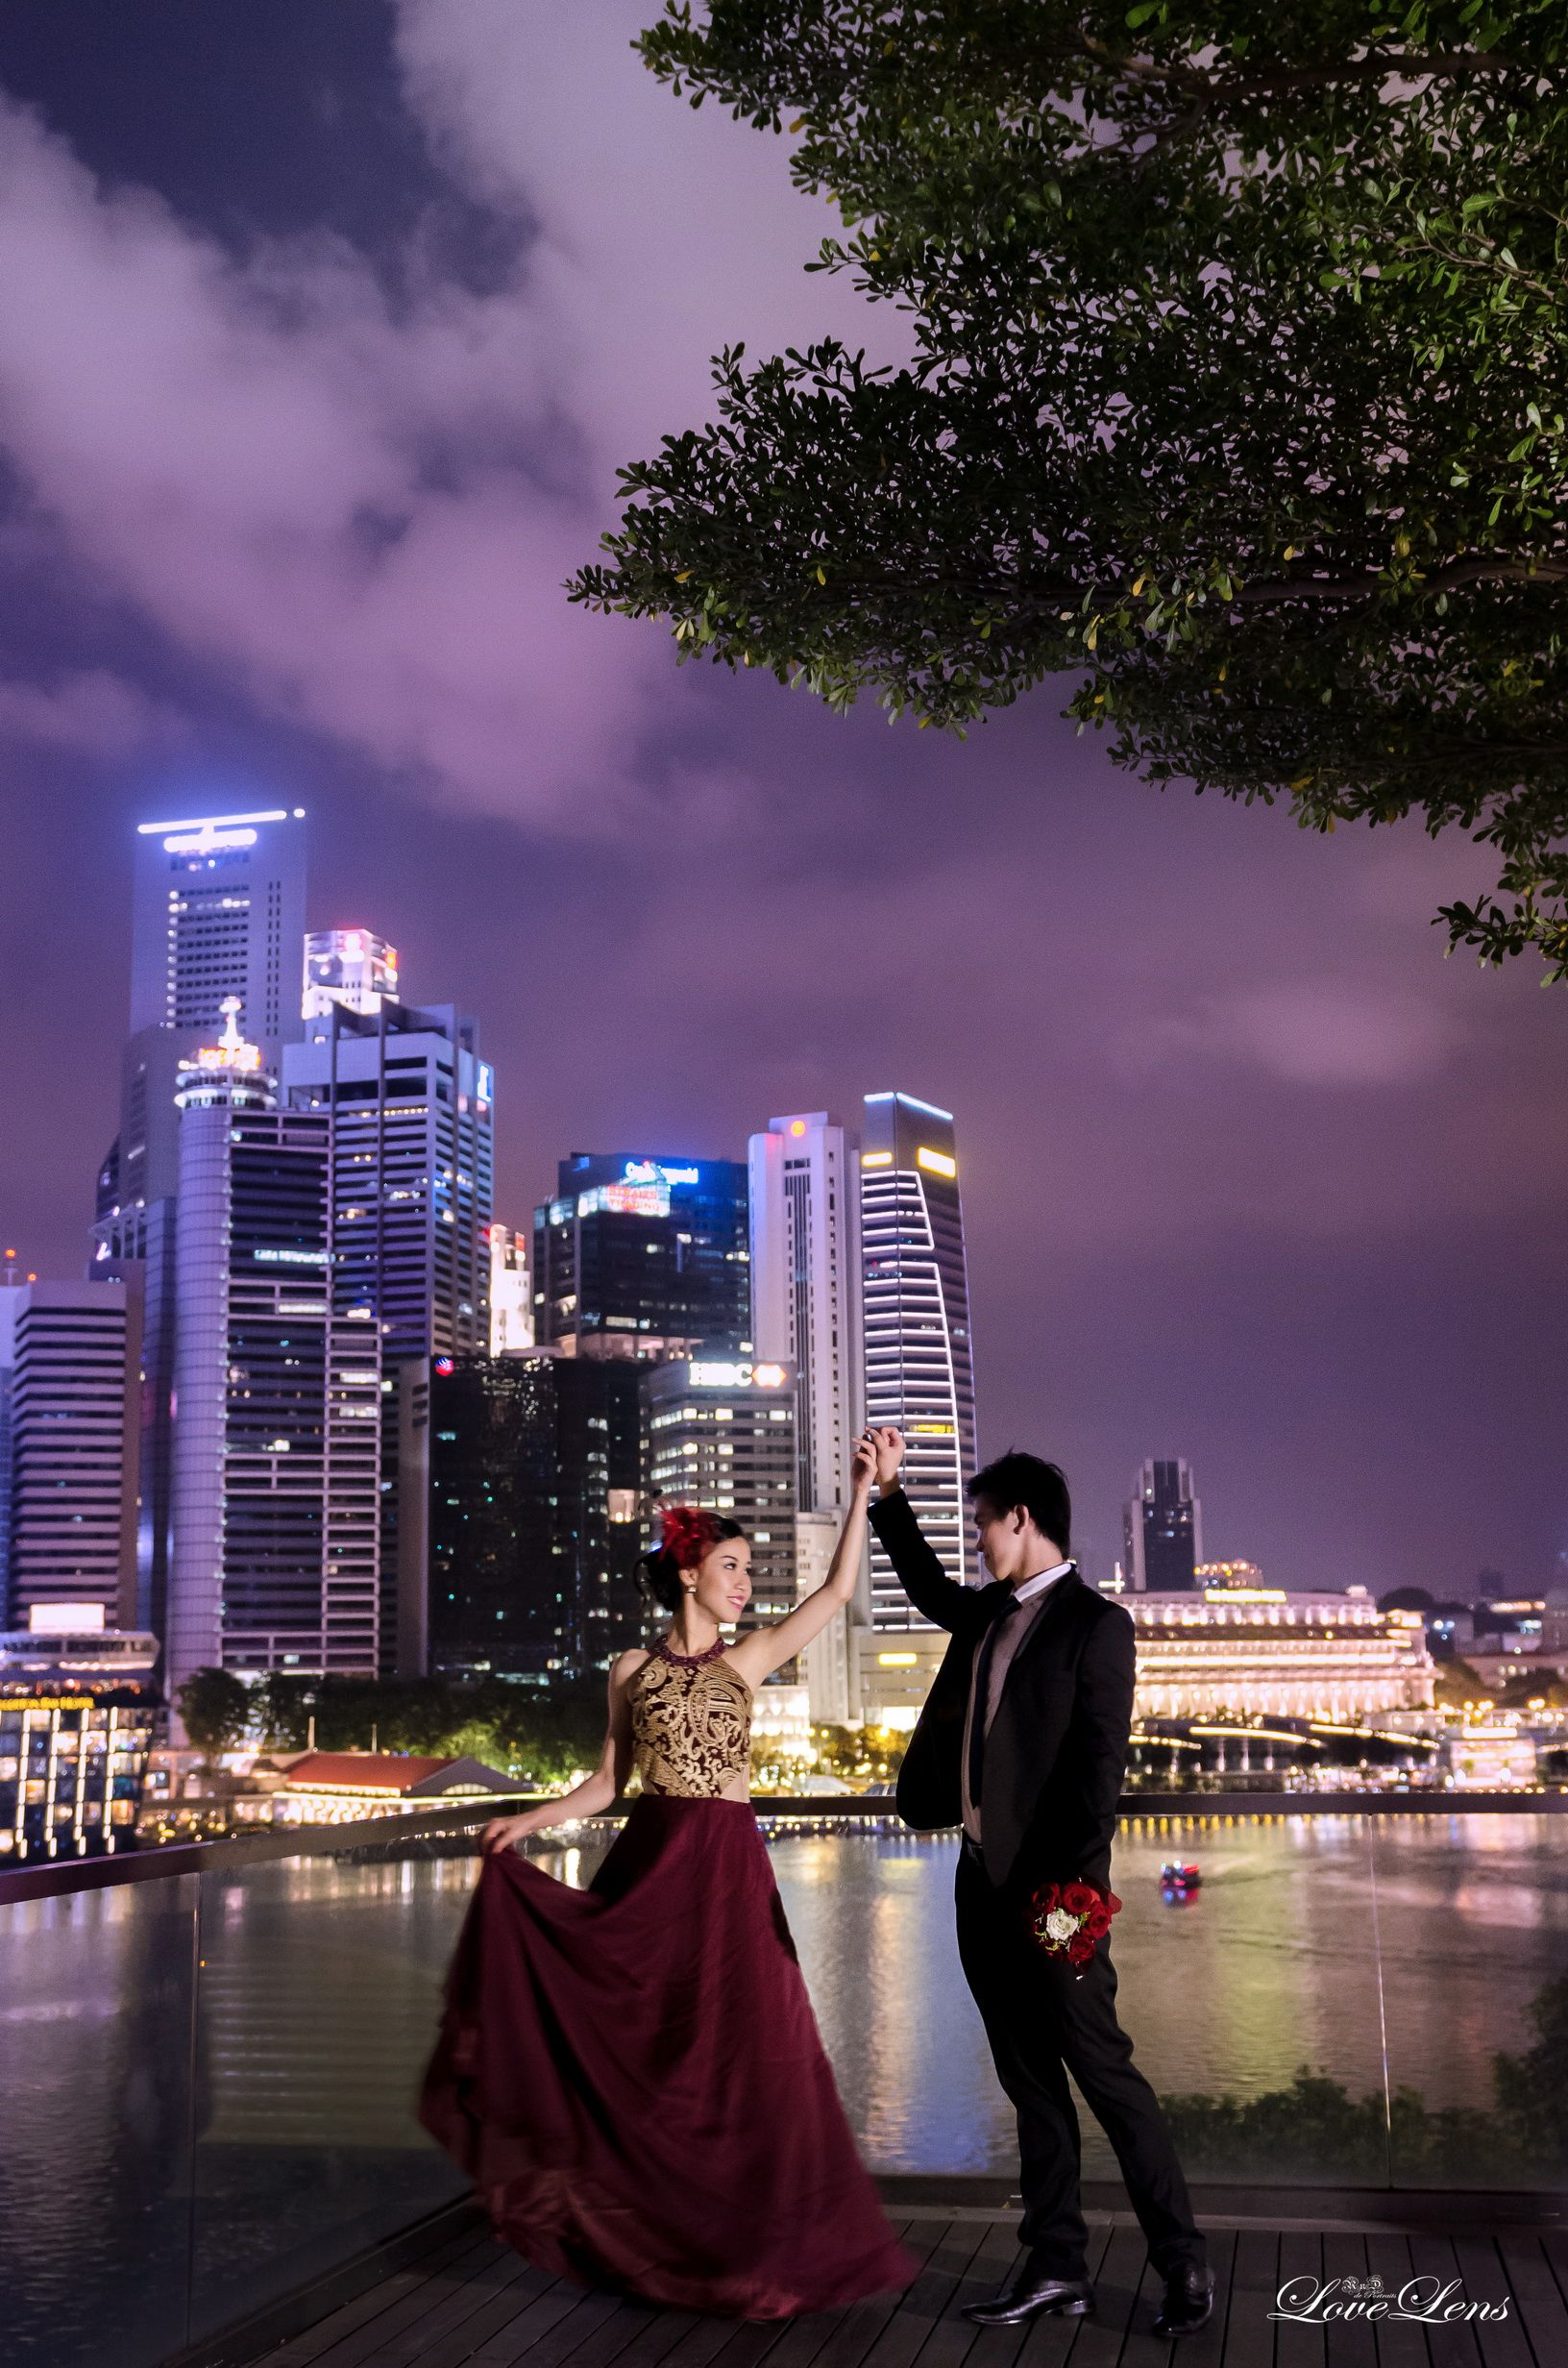 LOVELENS Singapore Prewedding Photography wwwLoveLens RnDcom